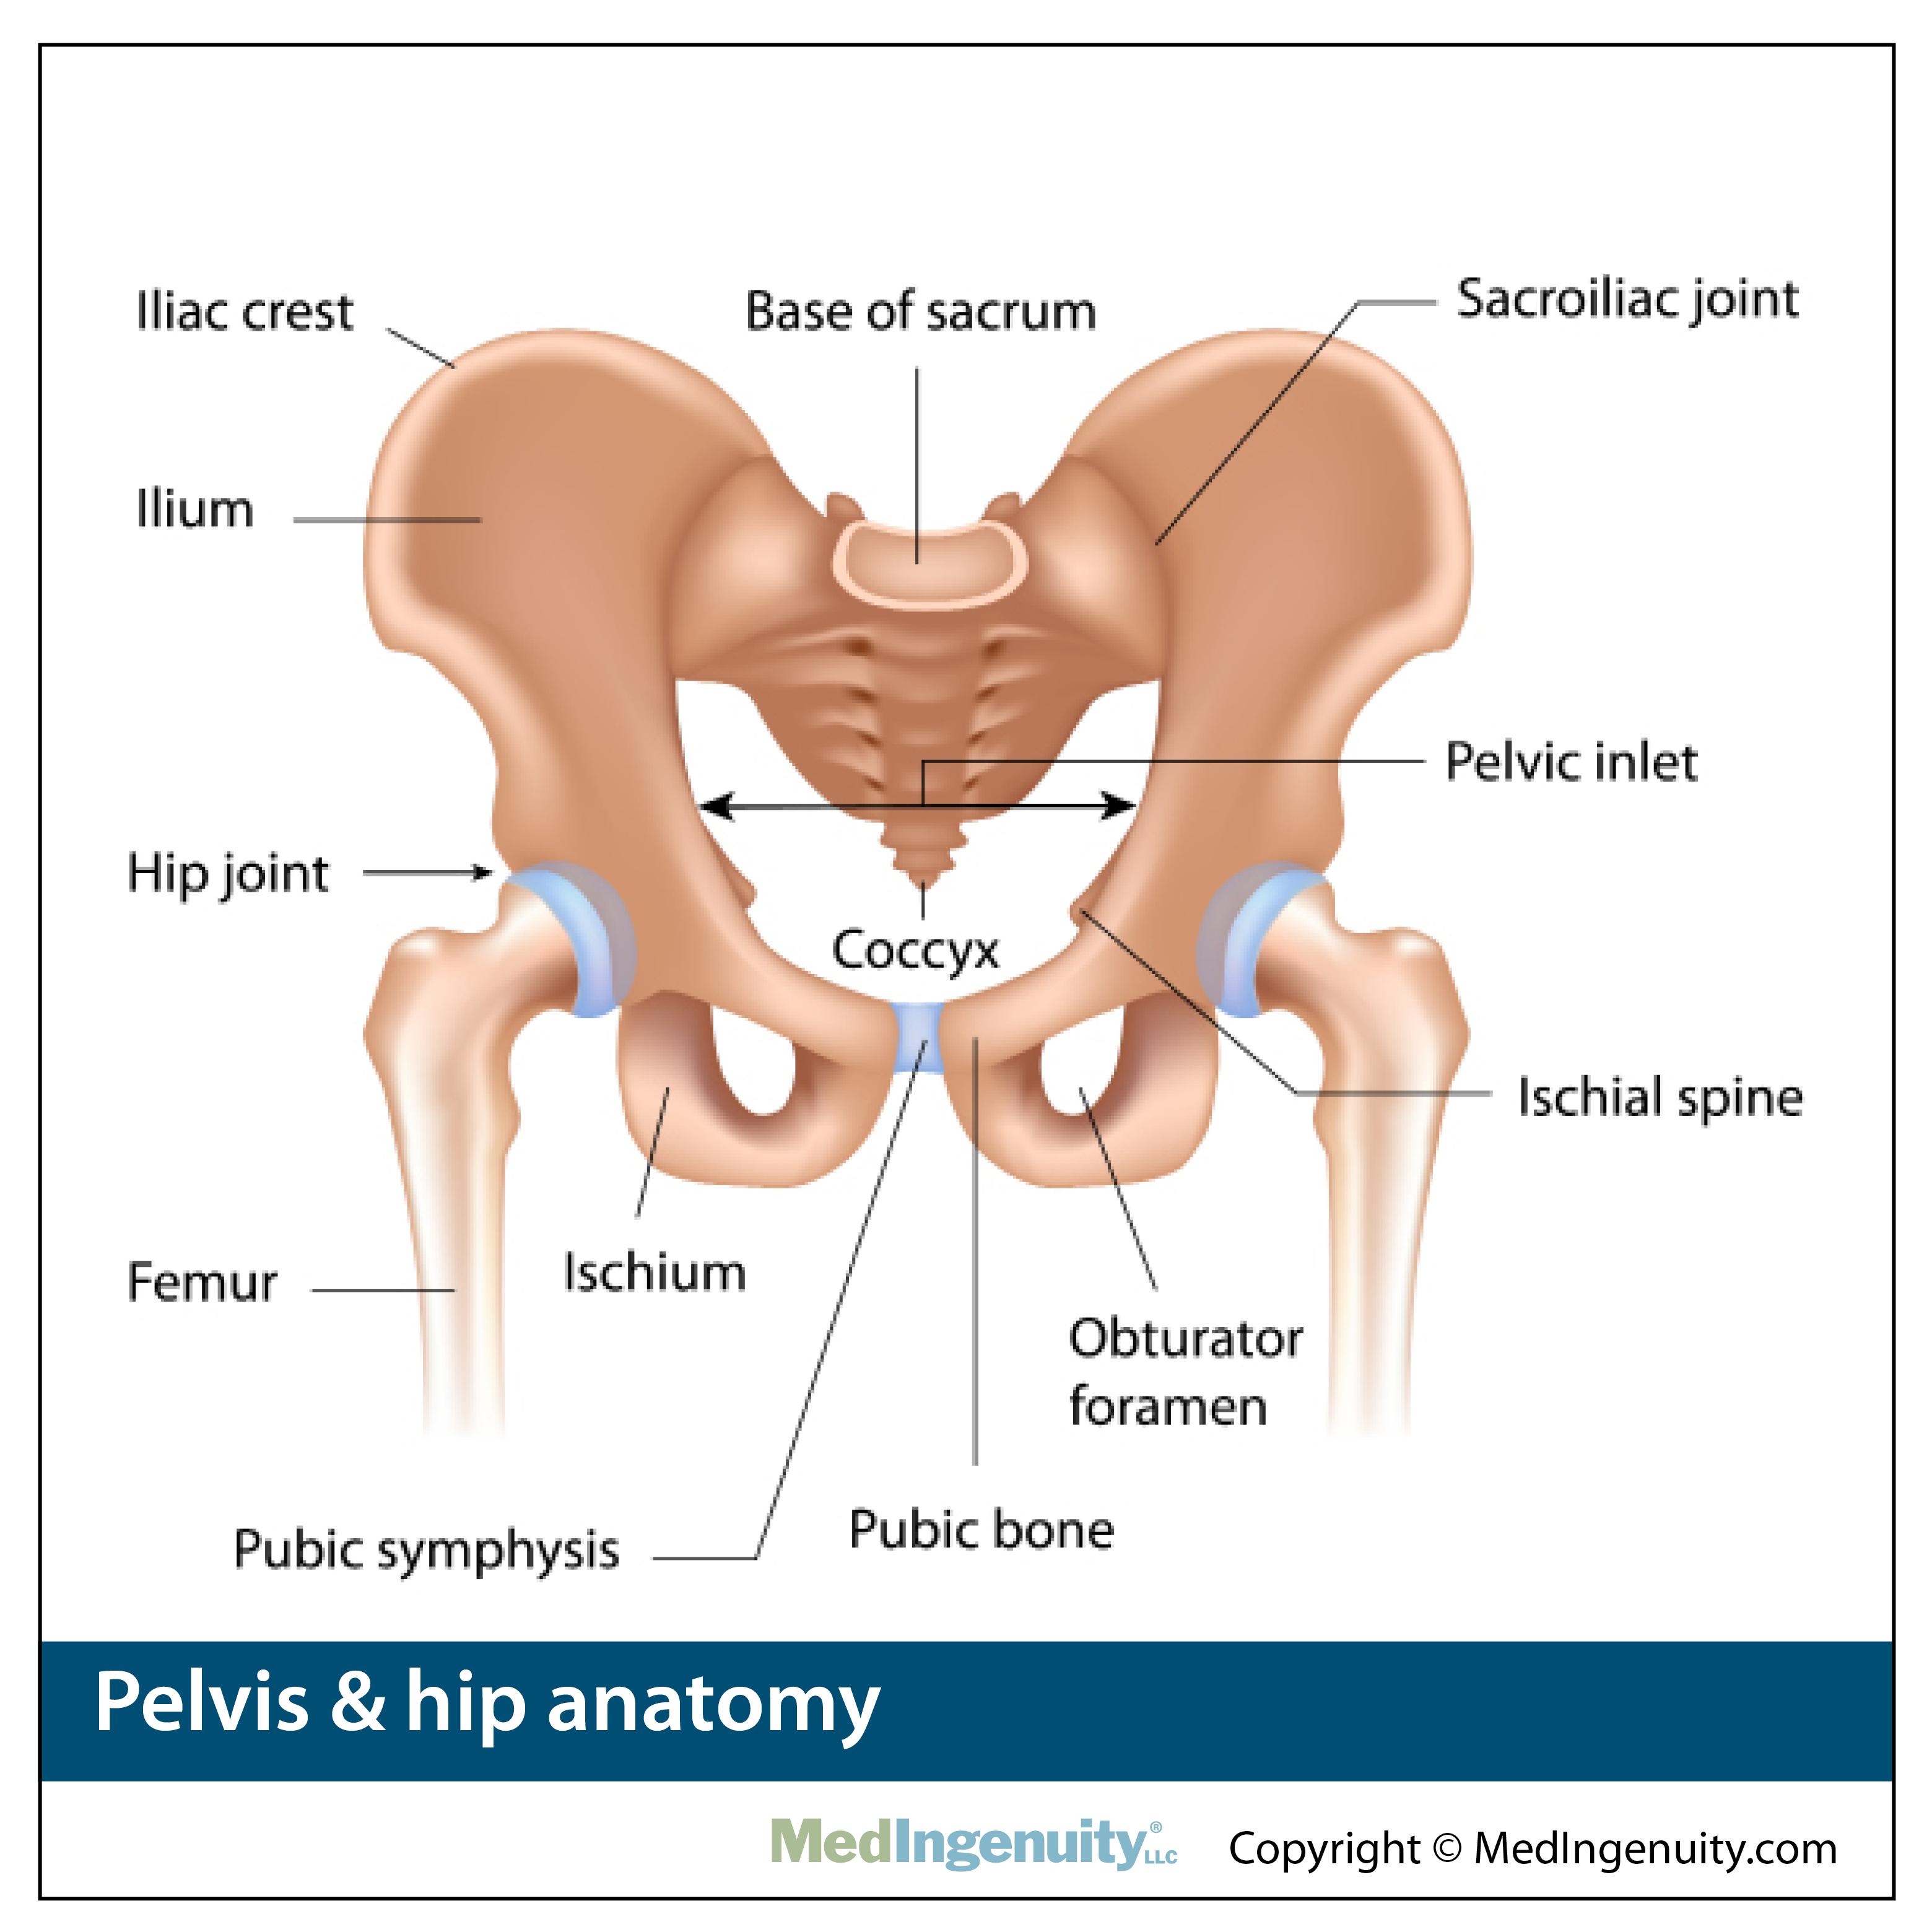 Northwest hills surgical hospital. Hurt clipart hip pain